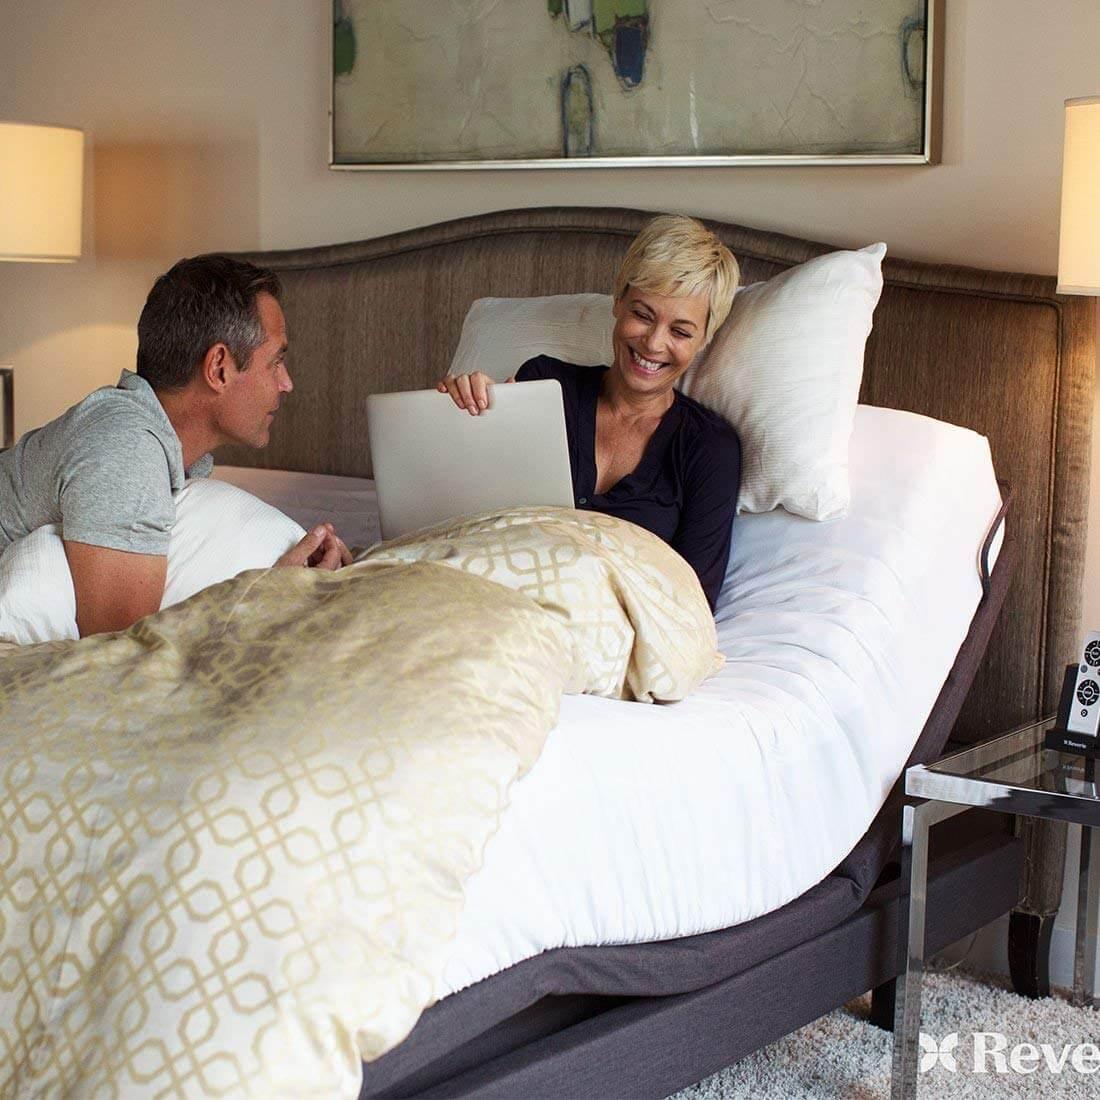 reverie 8q adjustable base head tilt wireless bluetooth massage under bed lighting